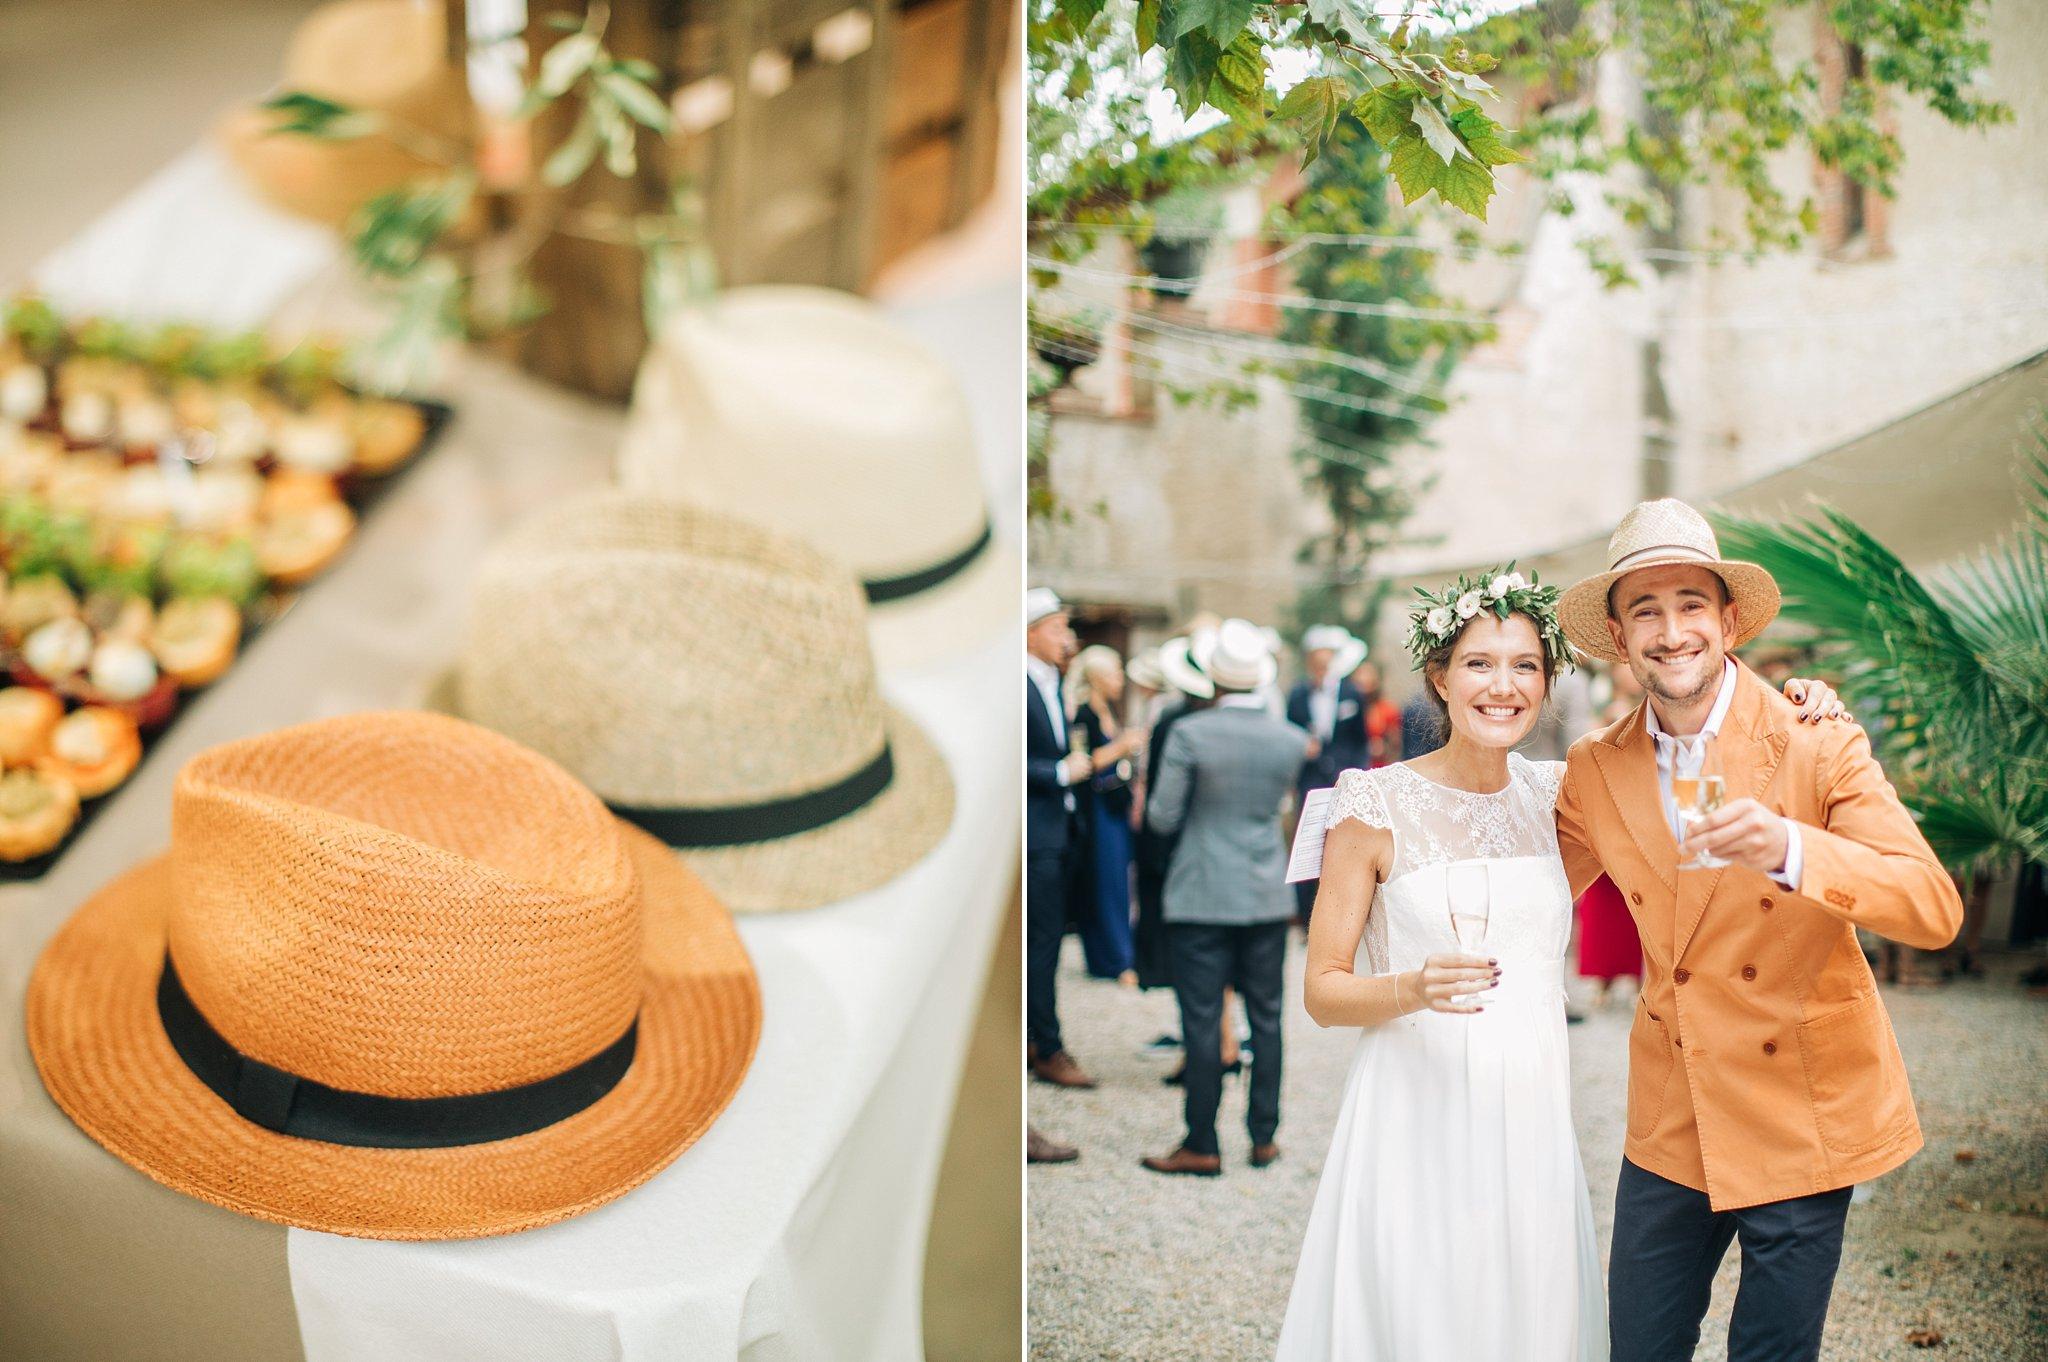 Wedding Photographer Perpignan - Château Las Collas Wedding - Hugo Hennequin071.jpg